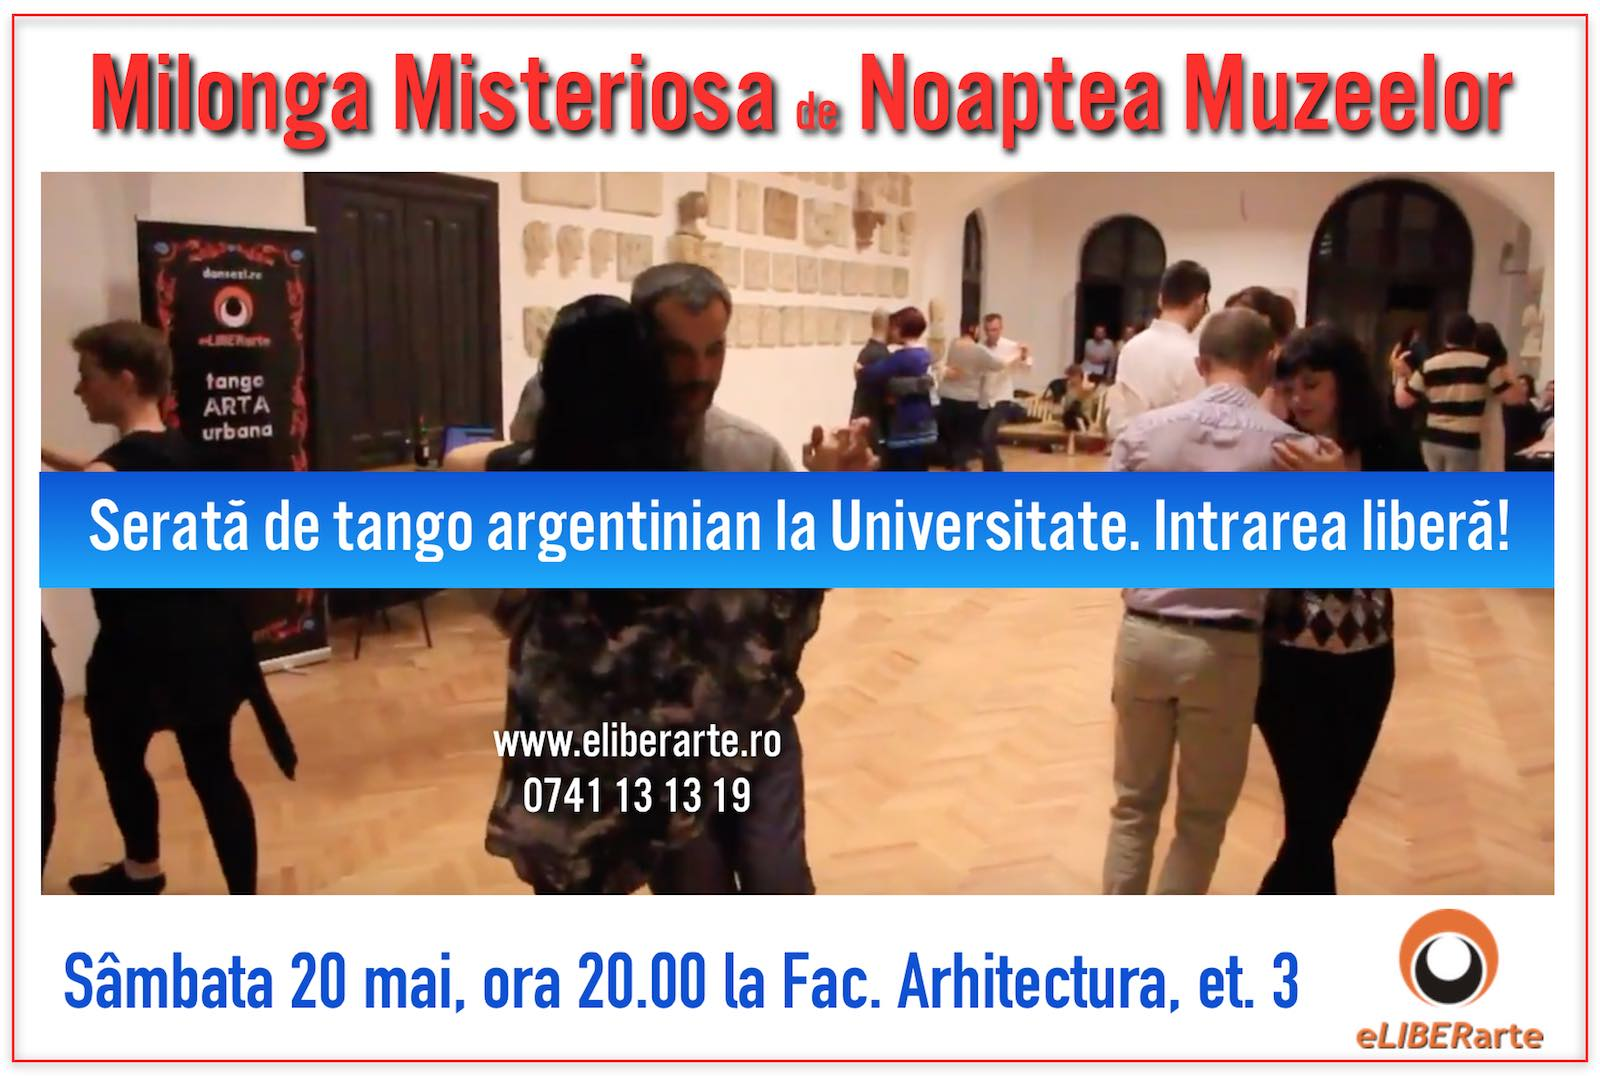 serata-tango-argentinian-milonga-misteriosa-20-mai-eliberarte